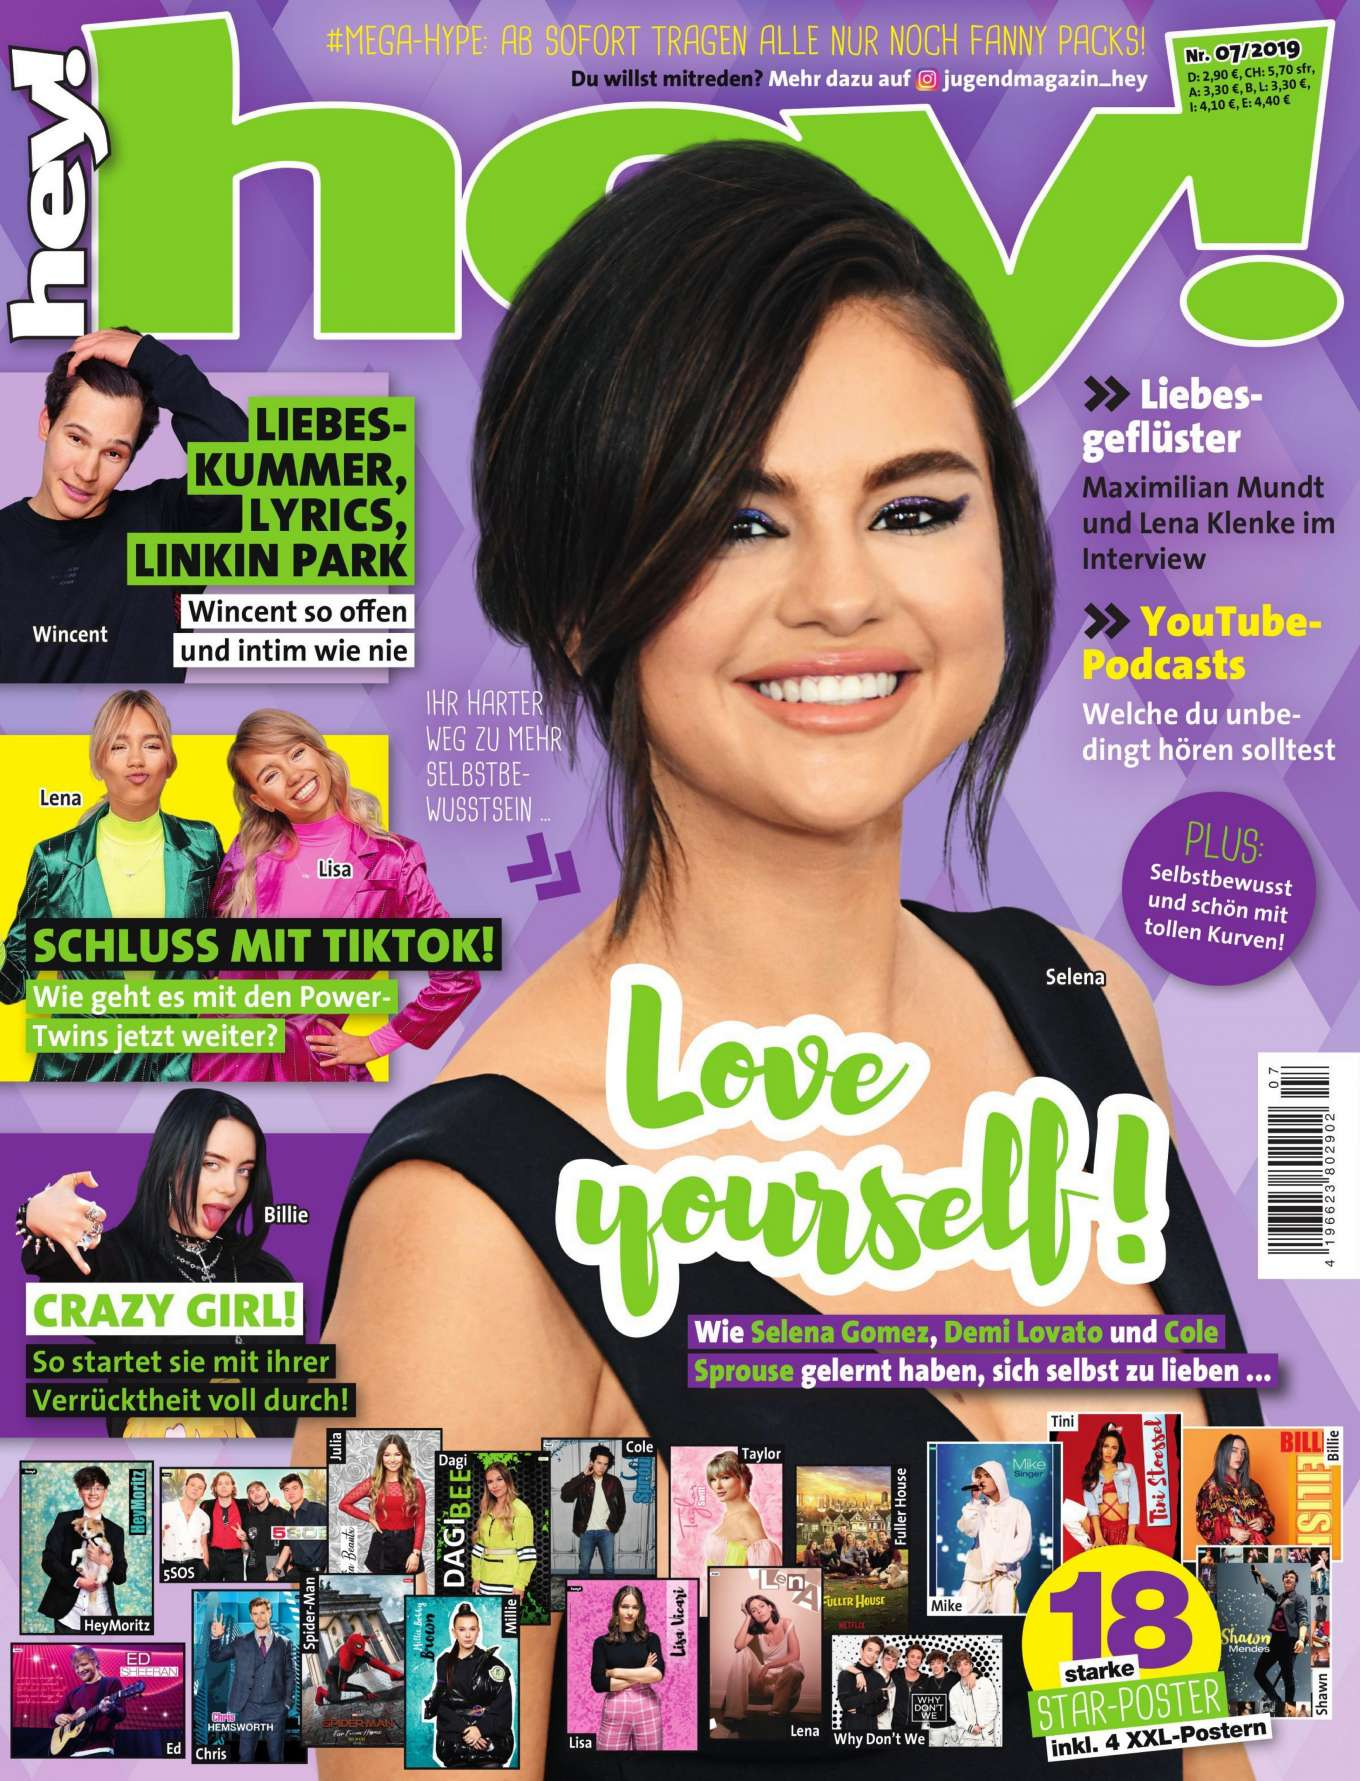 Selena Gomez - hey! Magazine (July 2019)